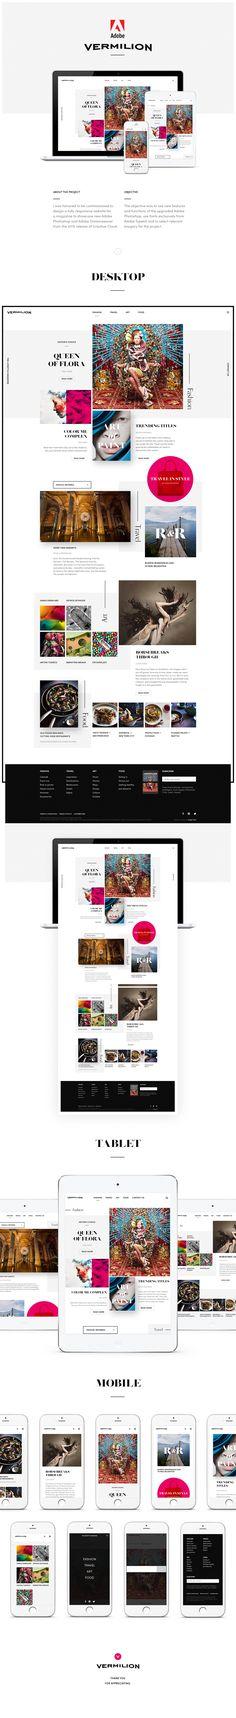 UI/UX Works by Serge Vasil | Abduzeedo Design Inspiration